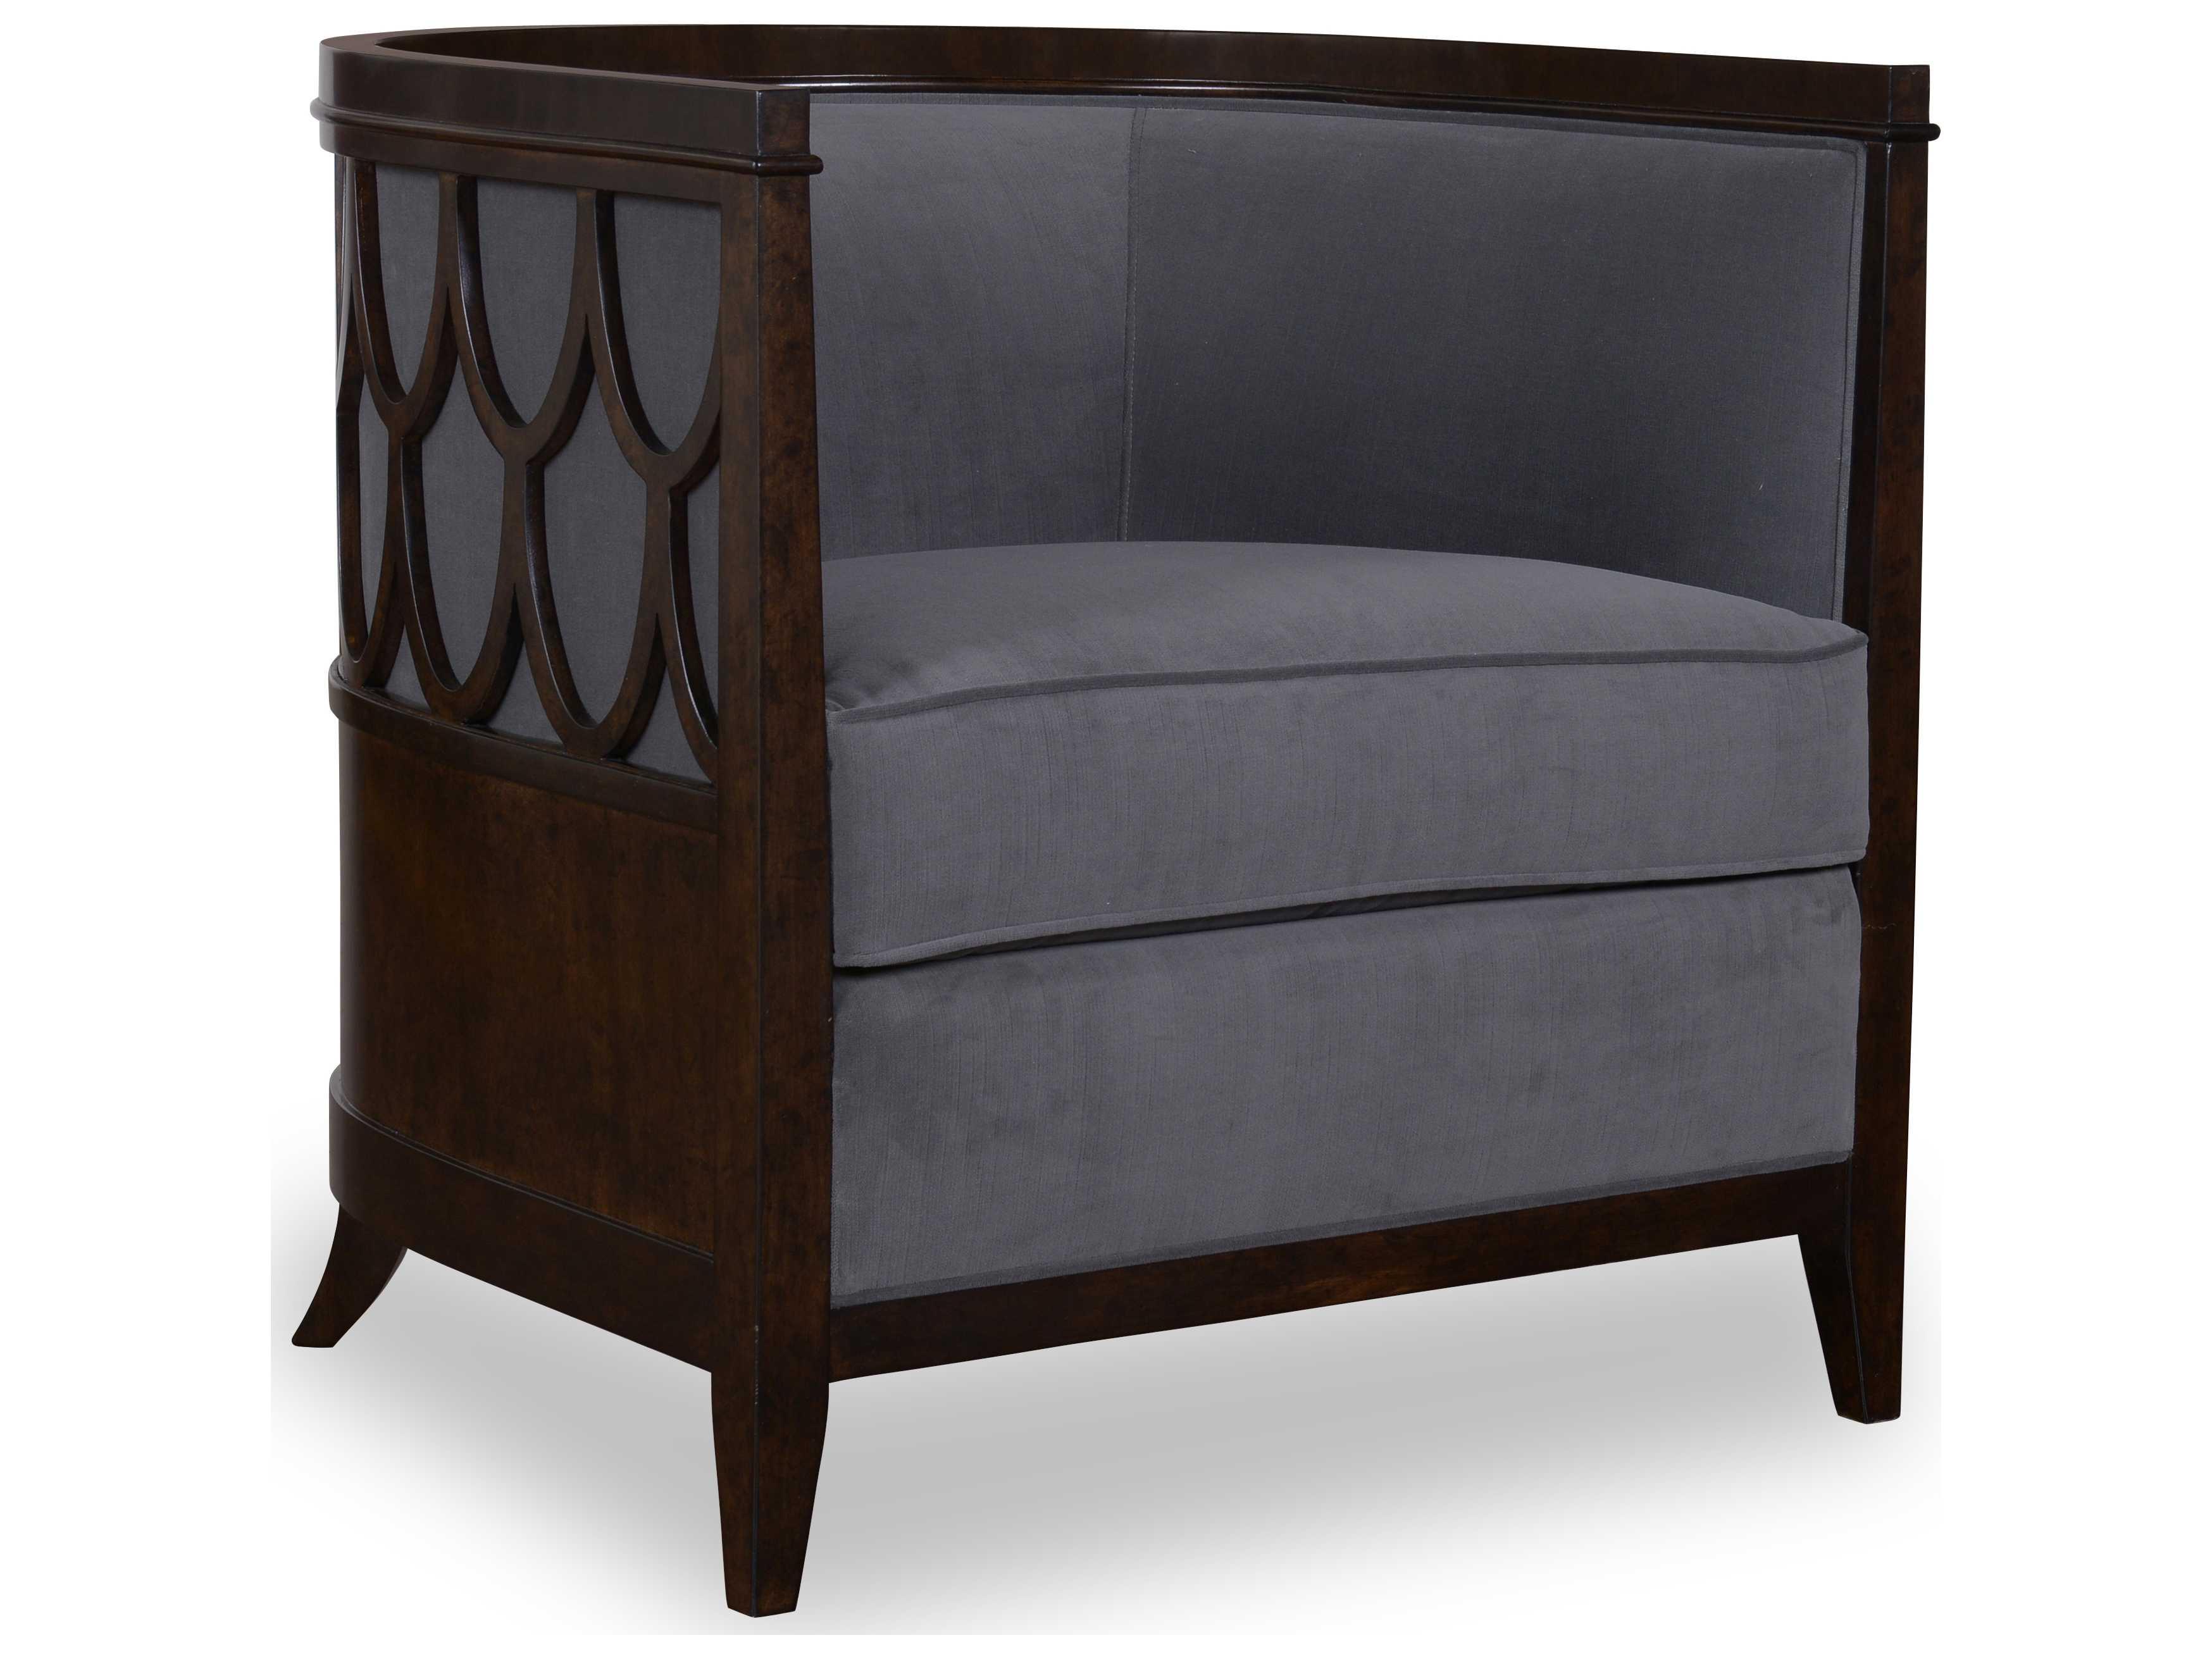 ART Furniture Morgan Charcoal Brindle Accent Chair